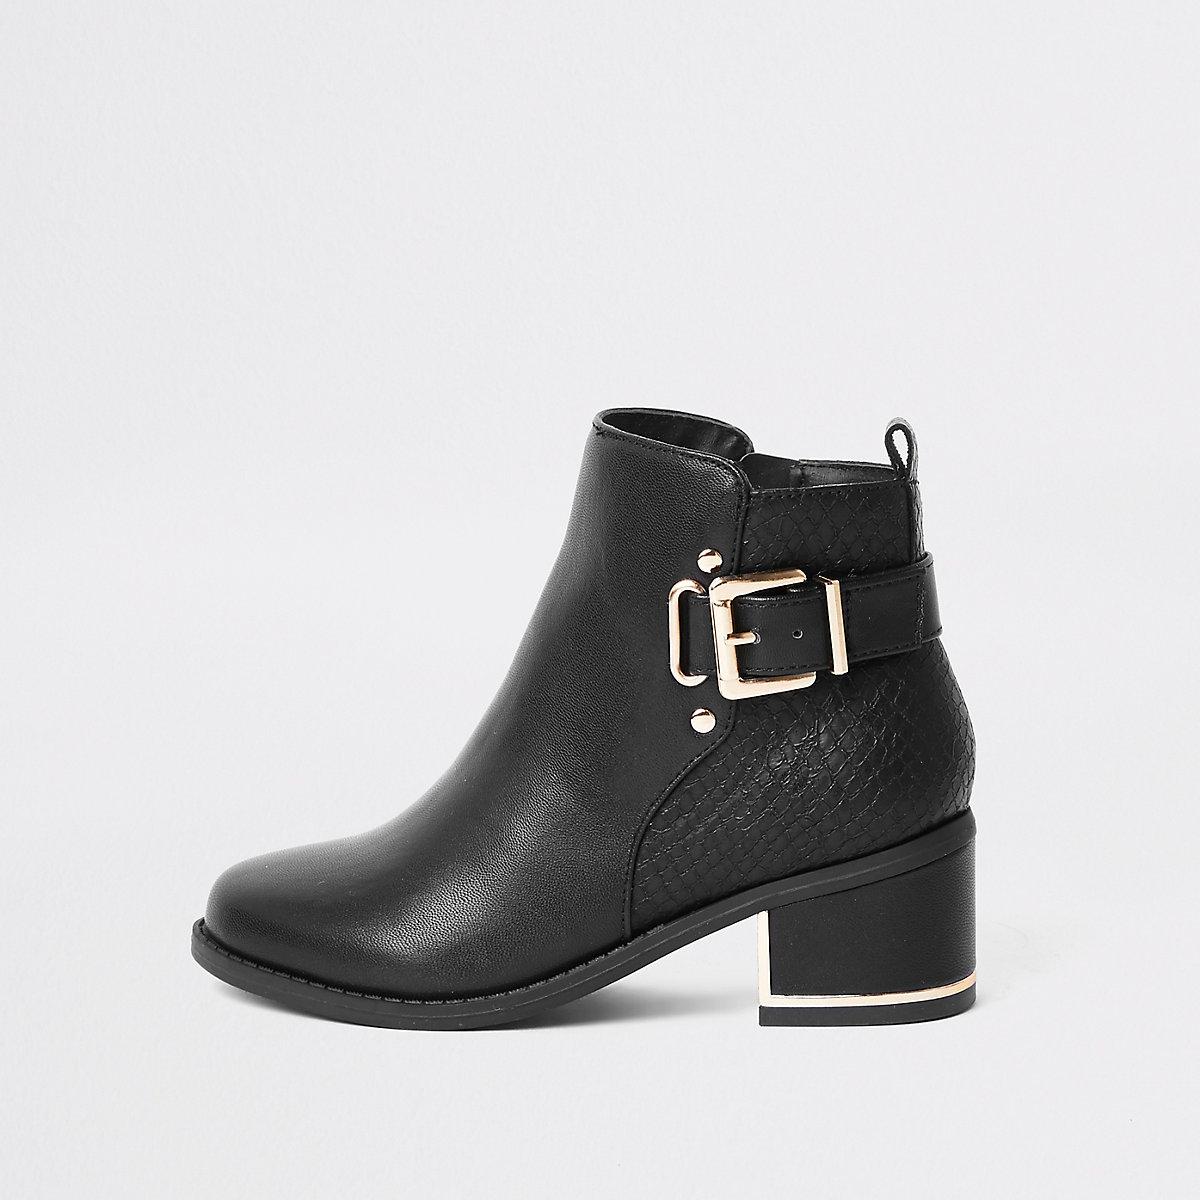 Girls black buckle heeled boots